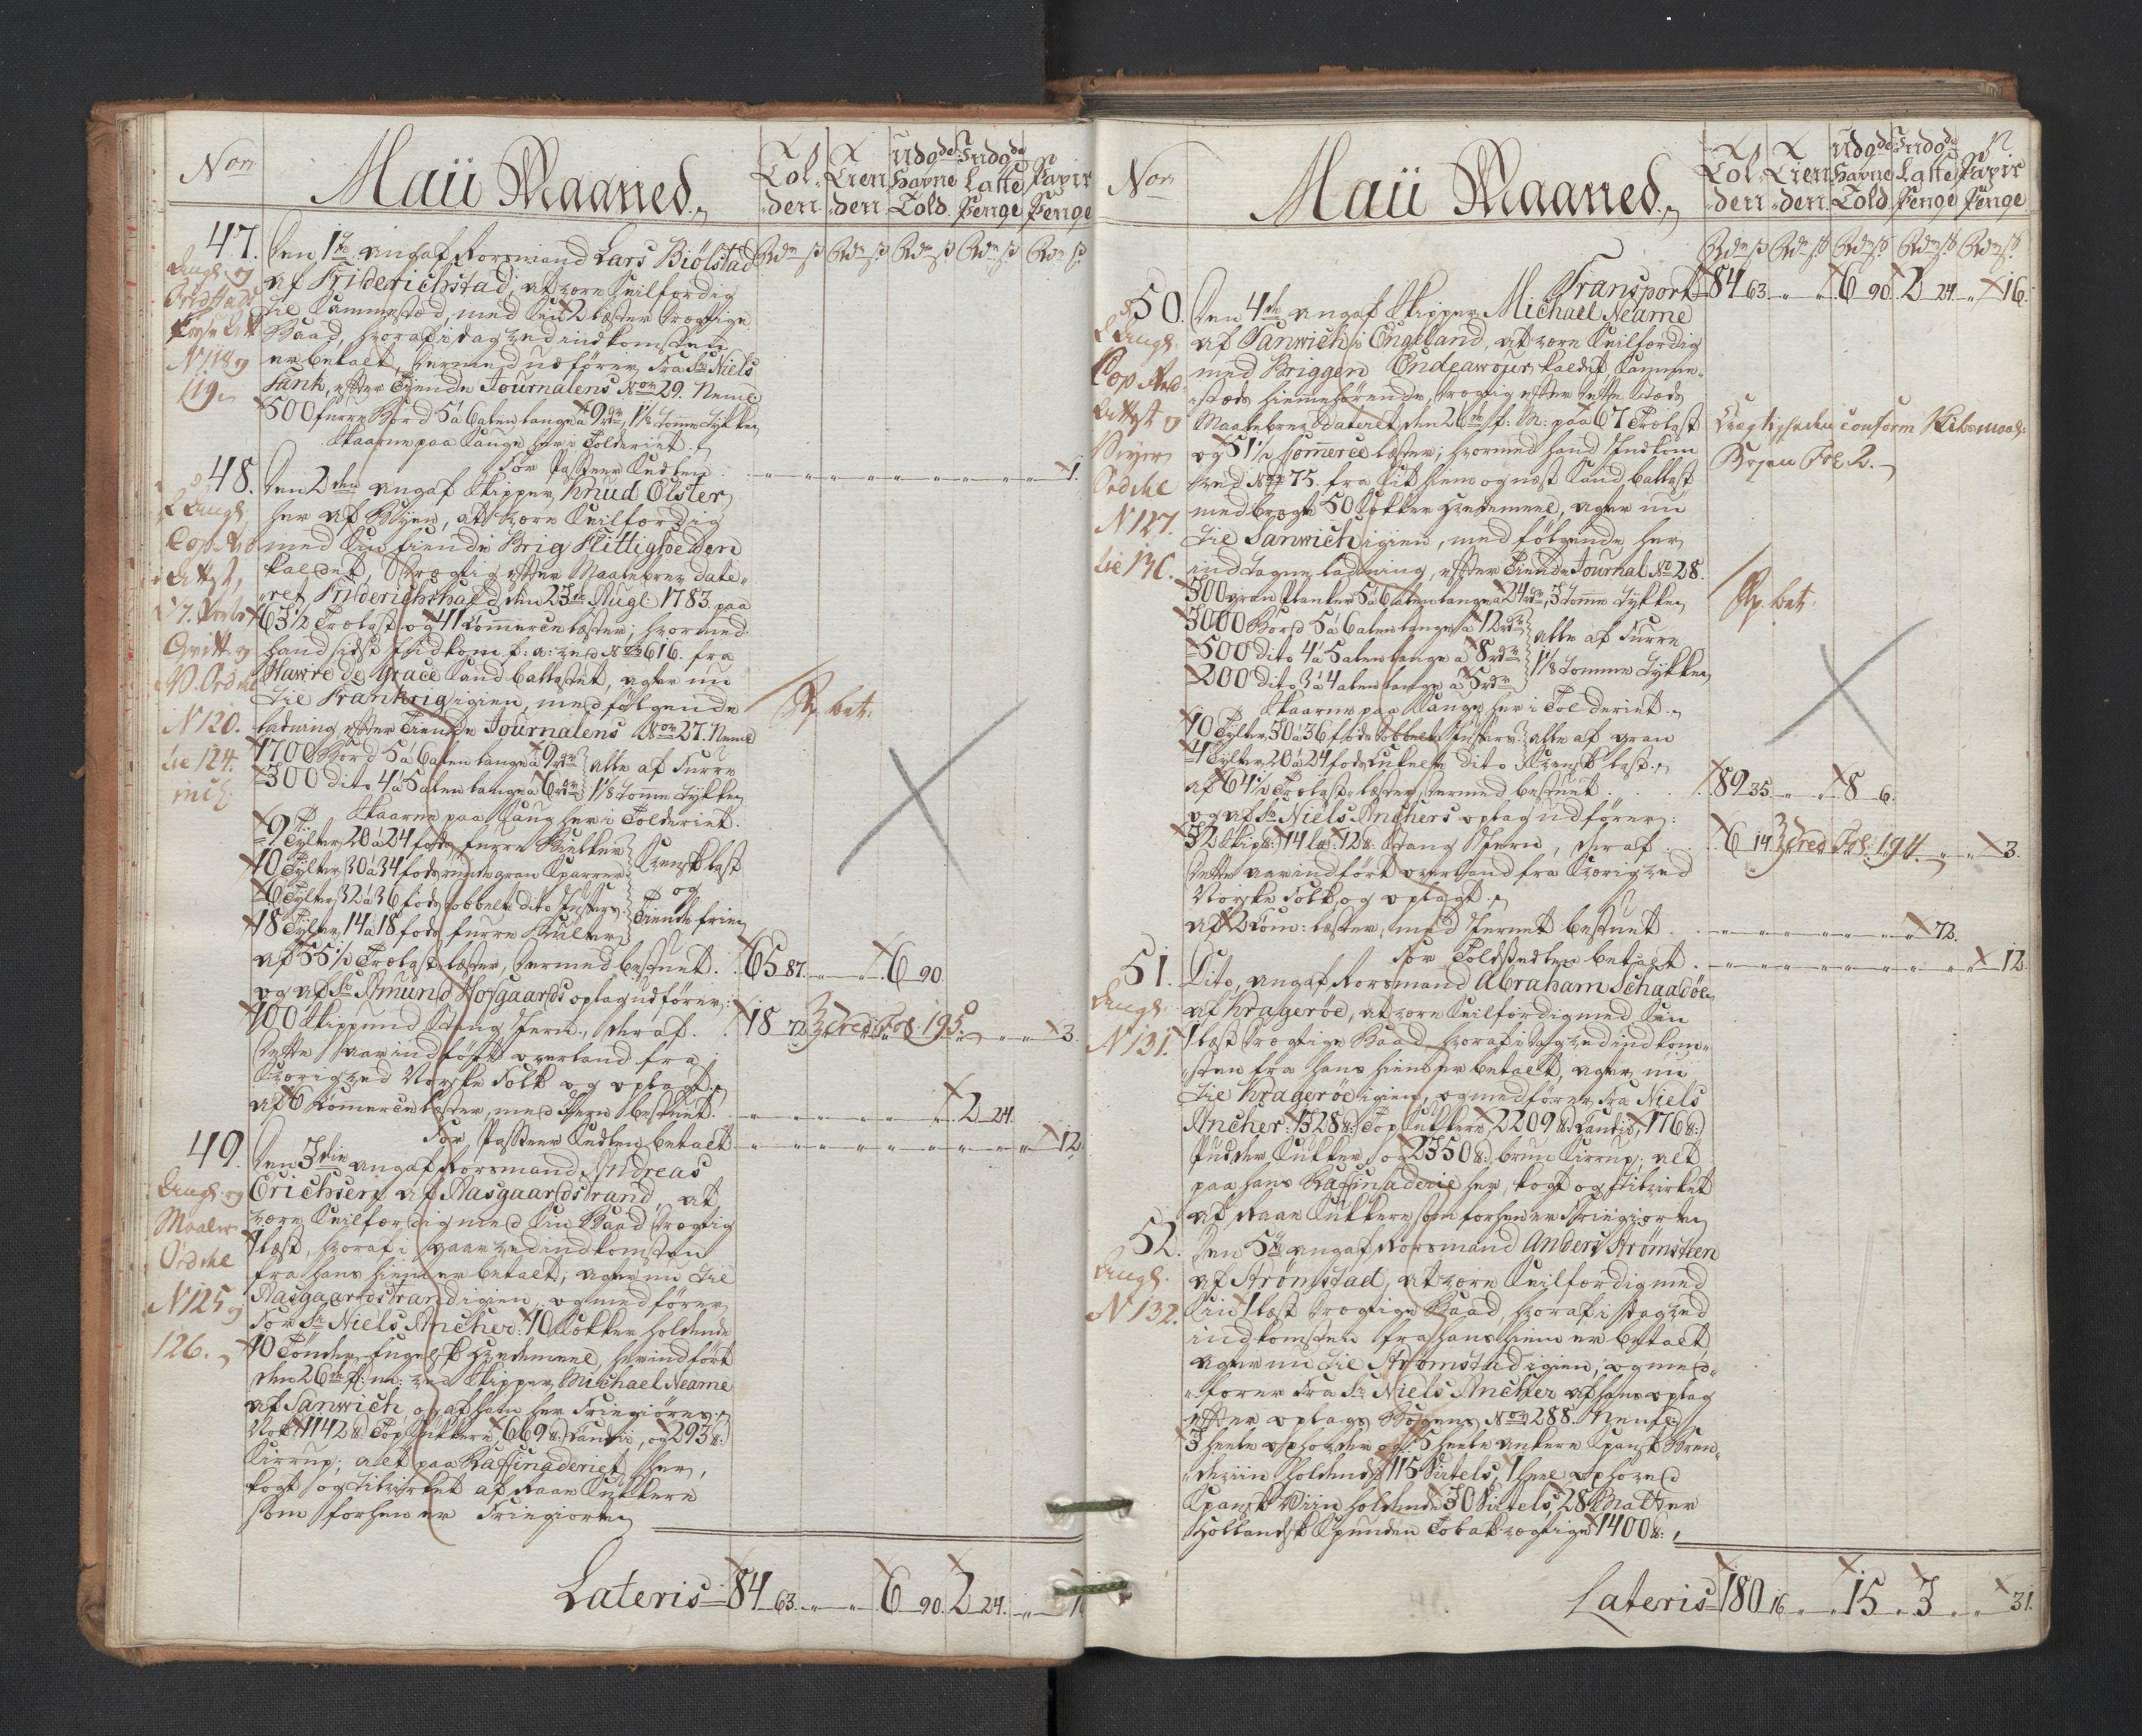 RA, Generaltollkammeret, tollregnskaper, R01/L0131: Tollregnskaper Fredrikshald, 1786, s. 11b-12a